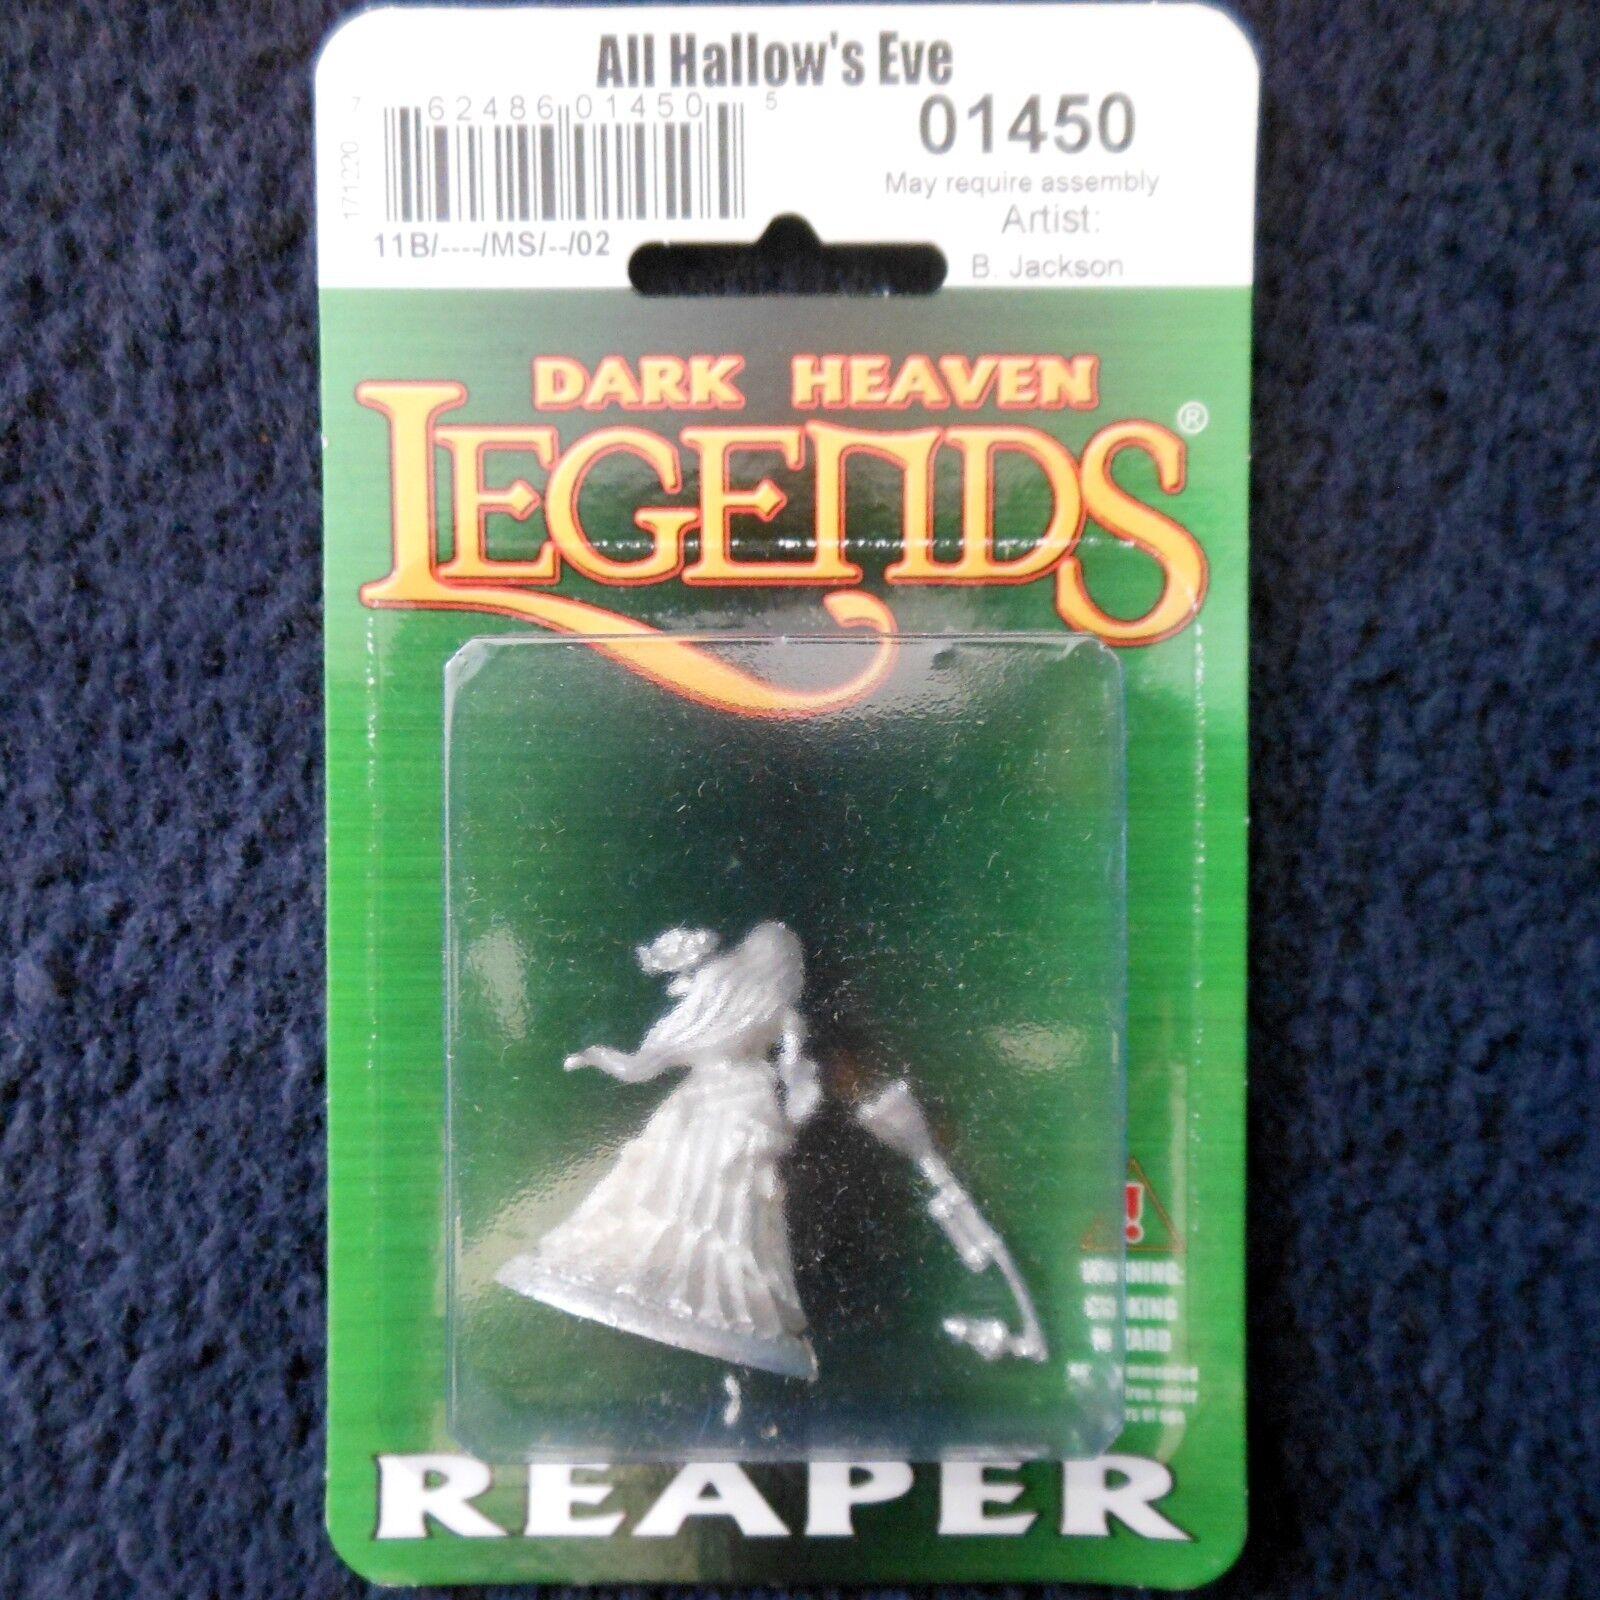 Reaper Dark Dark Dark Heaven Legends 01450 All Hallow's Eve Witch Female Sorceress Druid c331ec